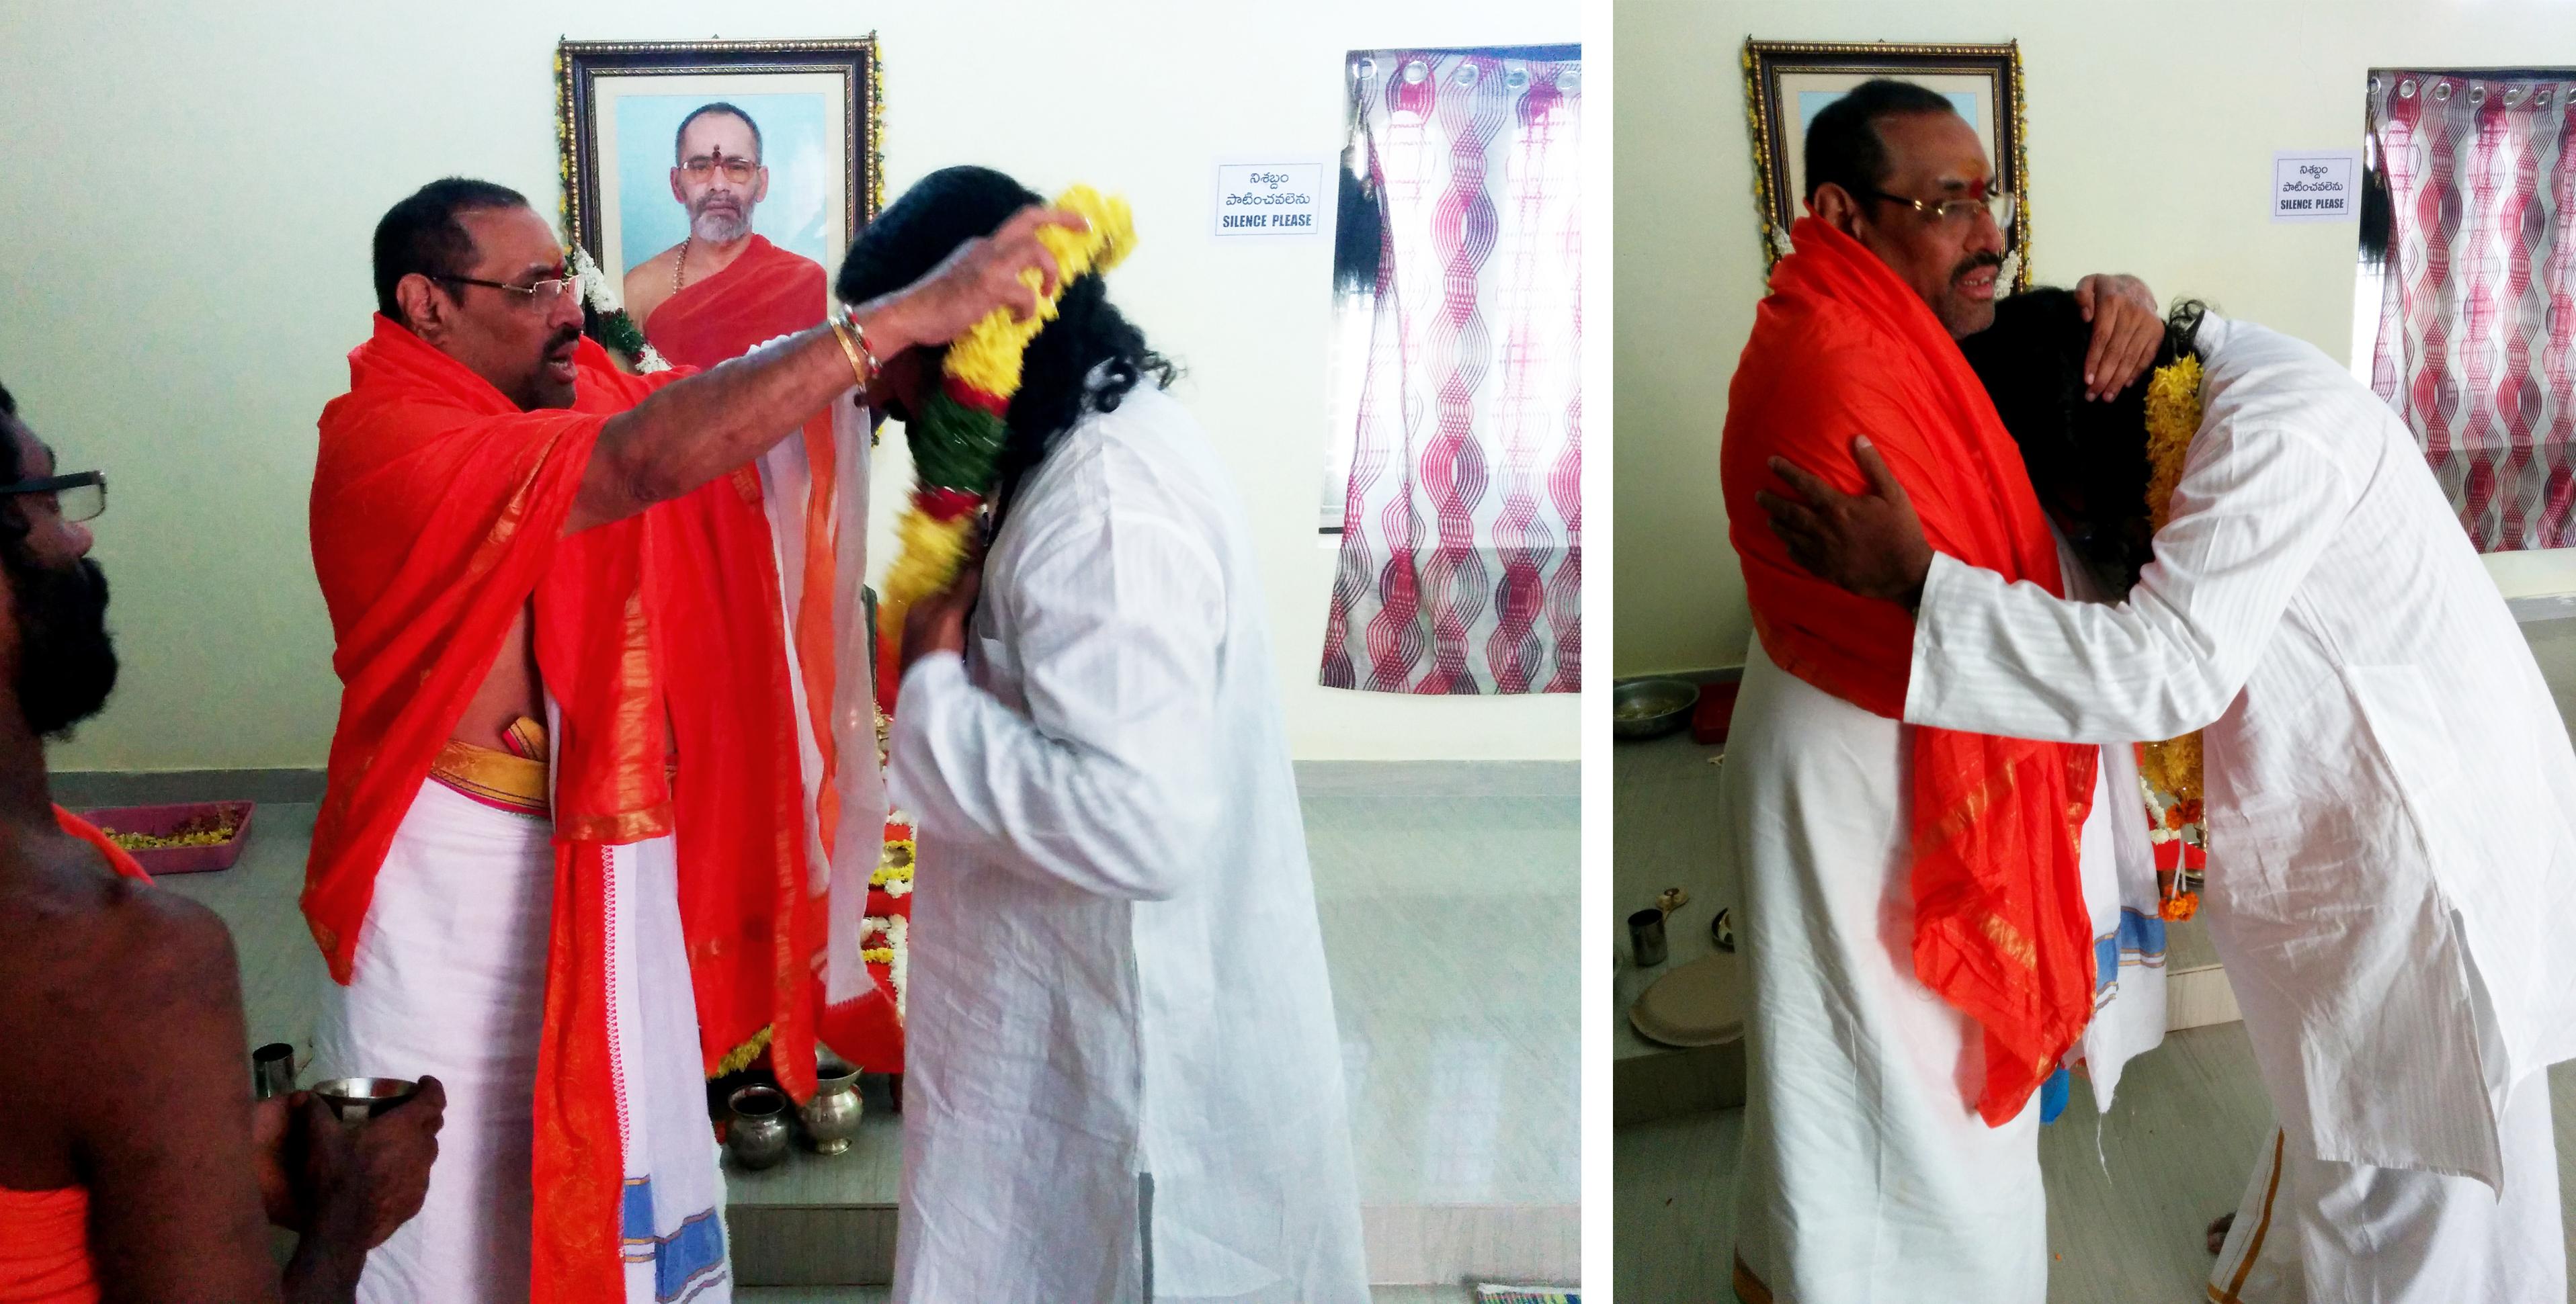 swamy-thyagananda-honouring-mohanji-love-of-the-masters